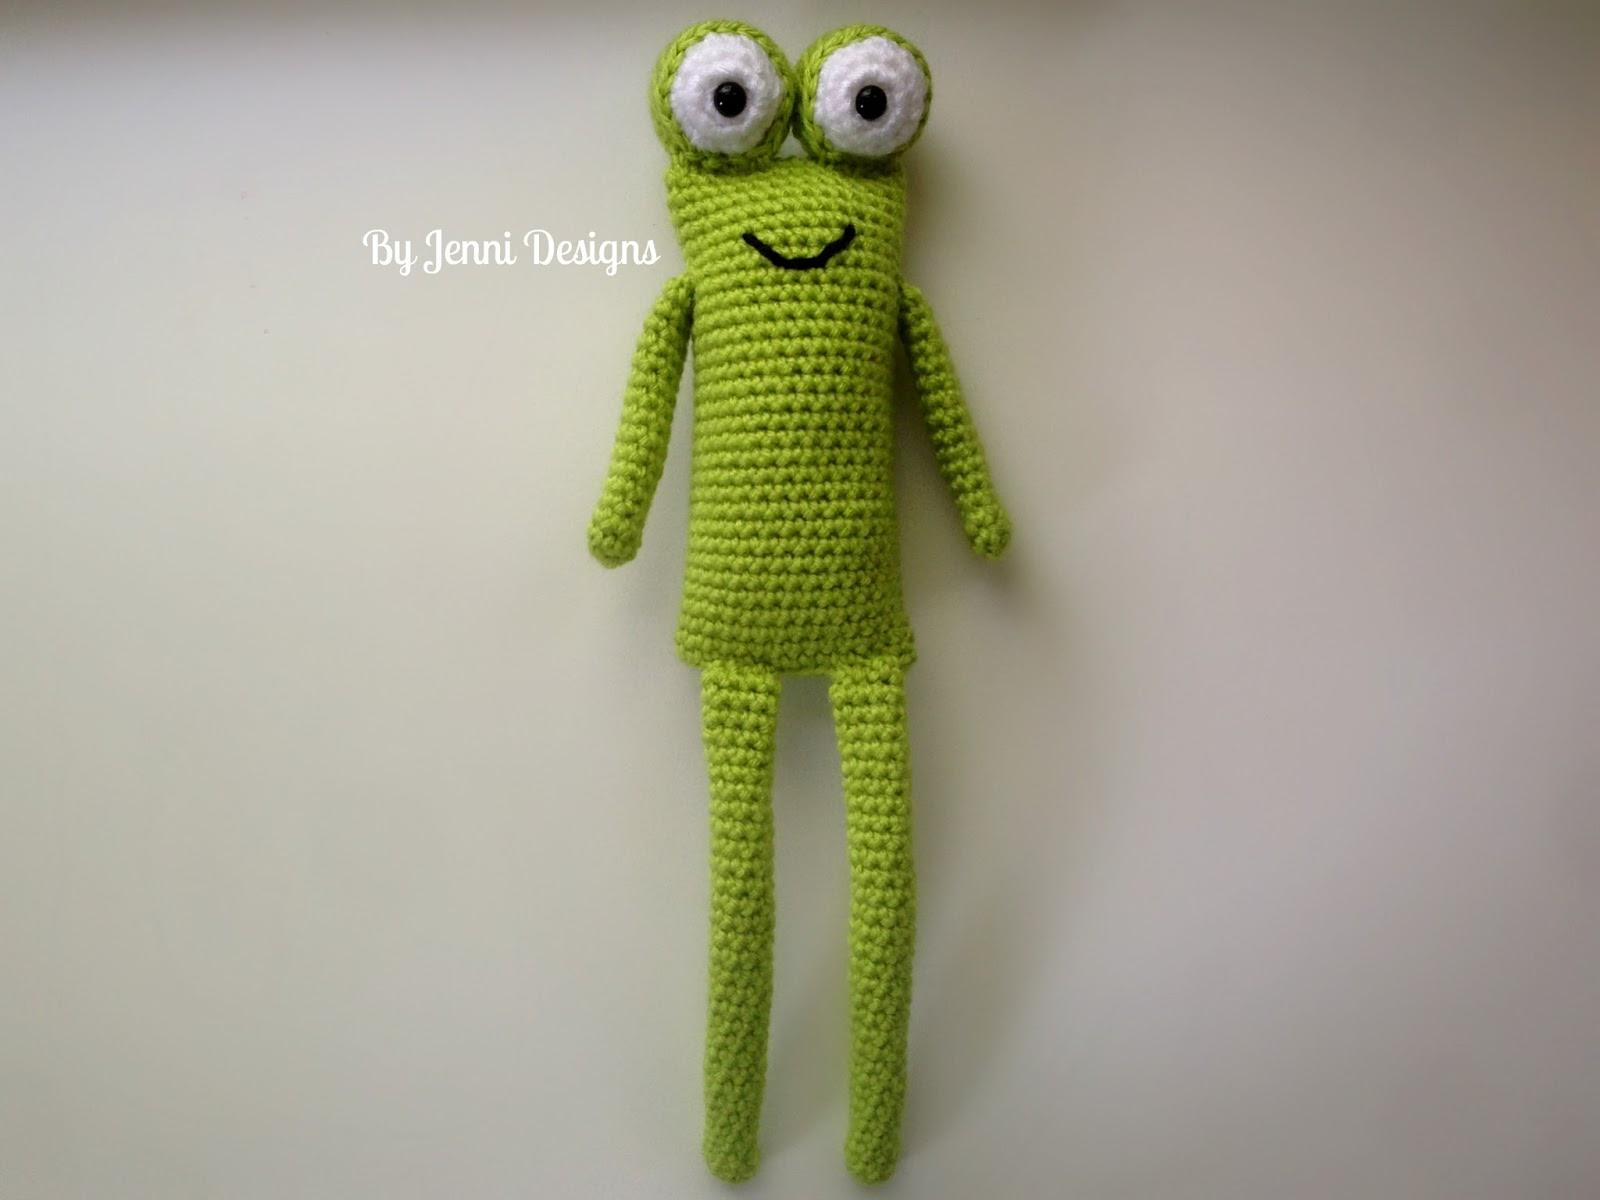 DIY Amigurumi Hand and Arm for Crochet Doll – Amigurumi Patterns | 1200x1600